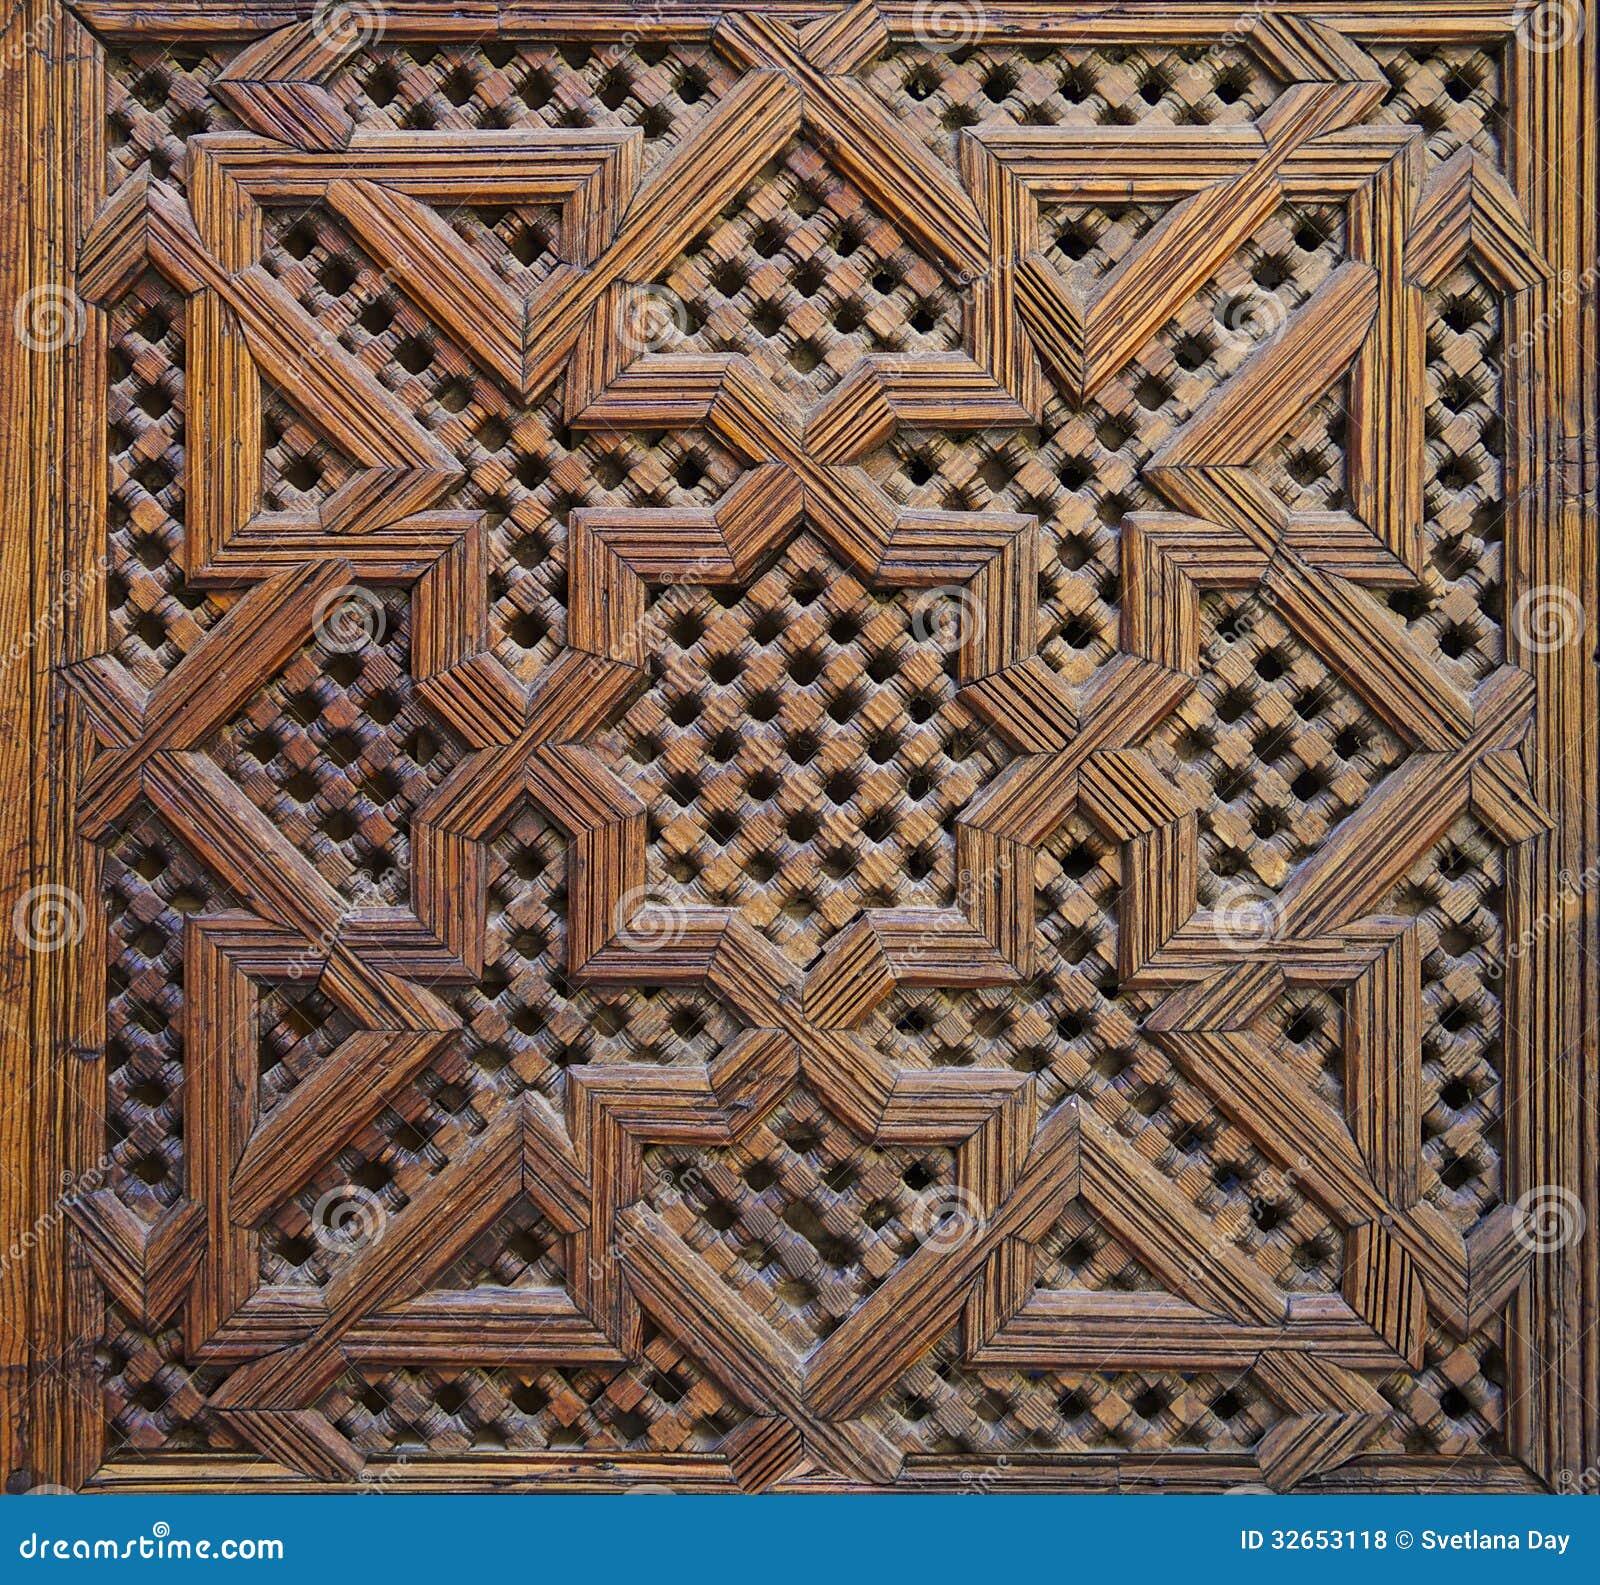 marocain cedar wood arabesque carving photos libres de droits image 32653118. Black Bedroom Furniture Sets. Home Design Ideas